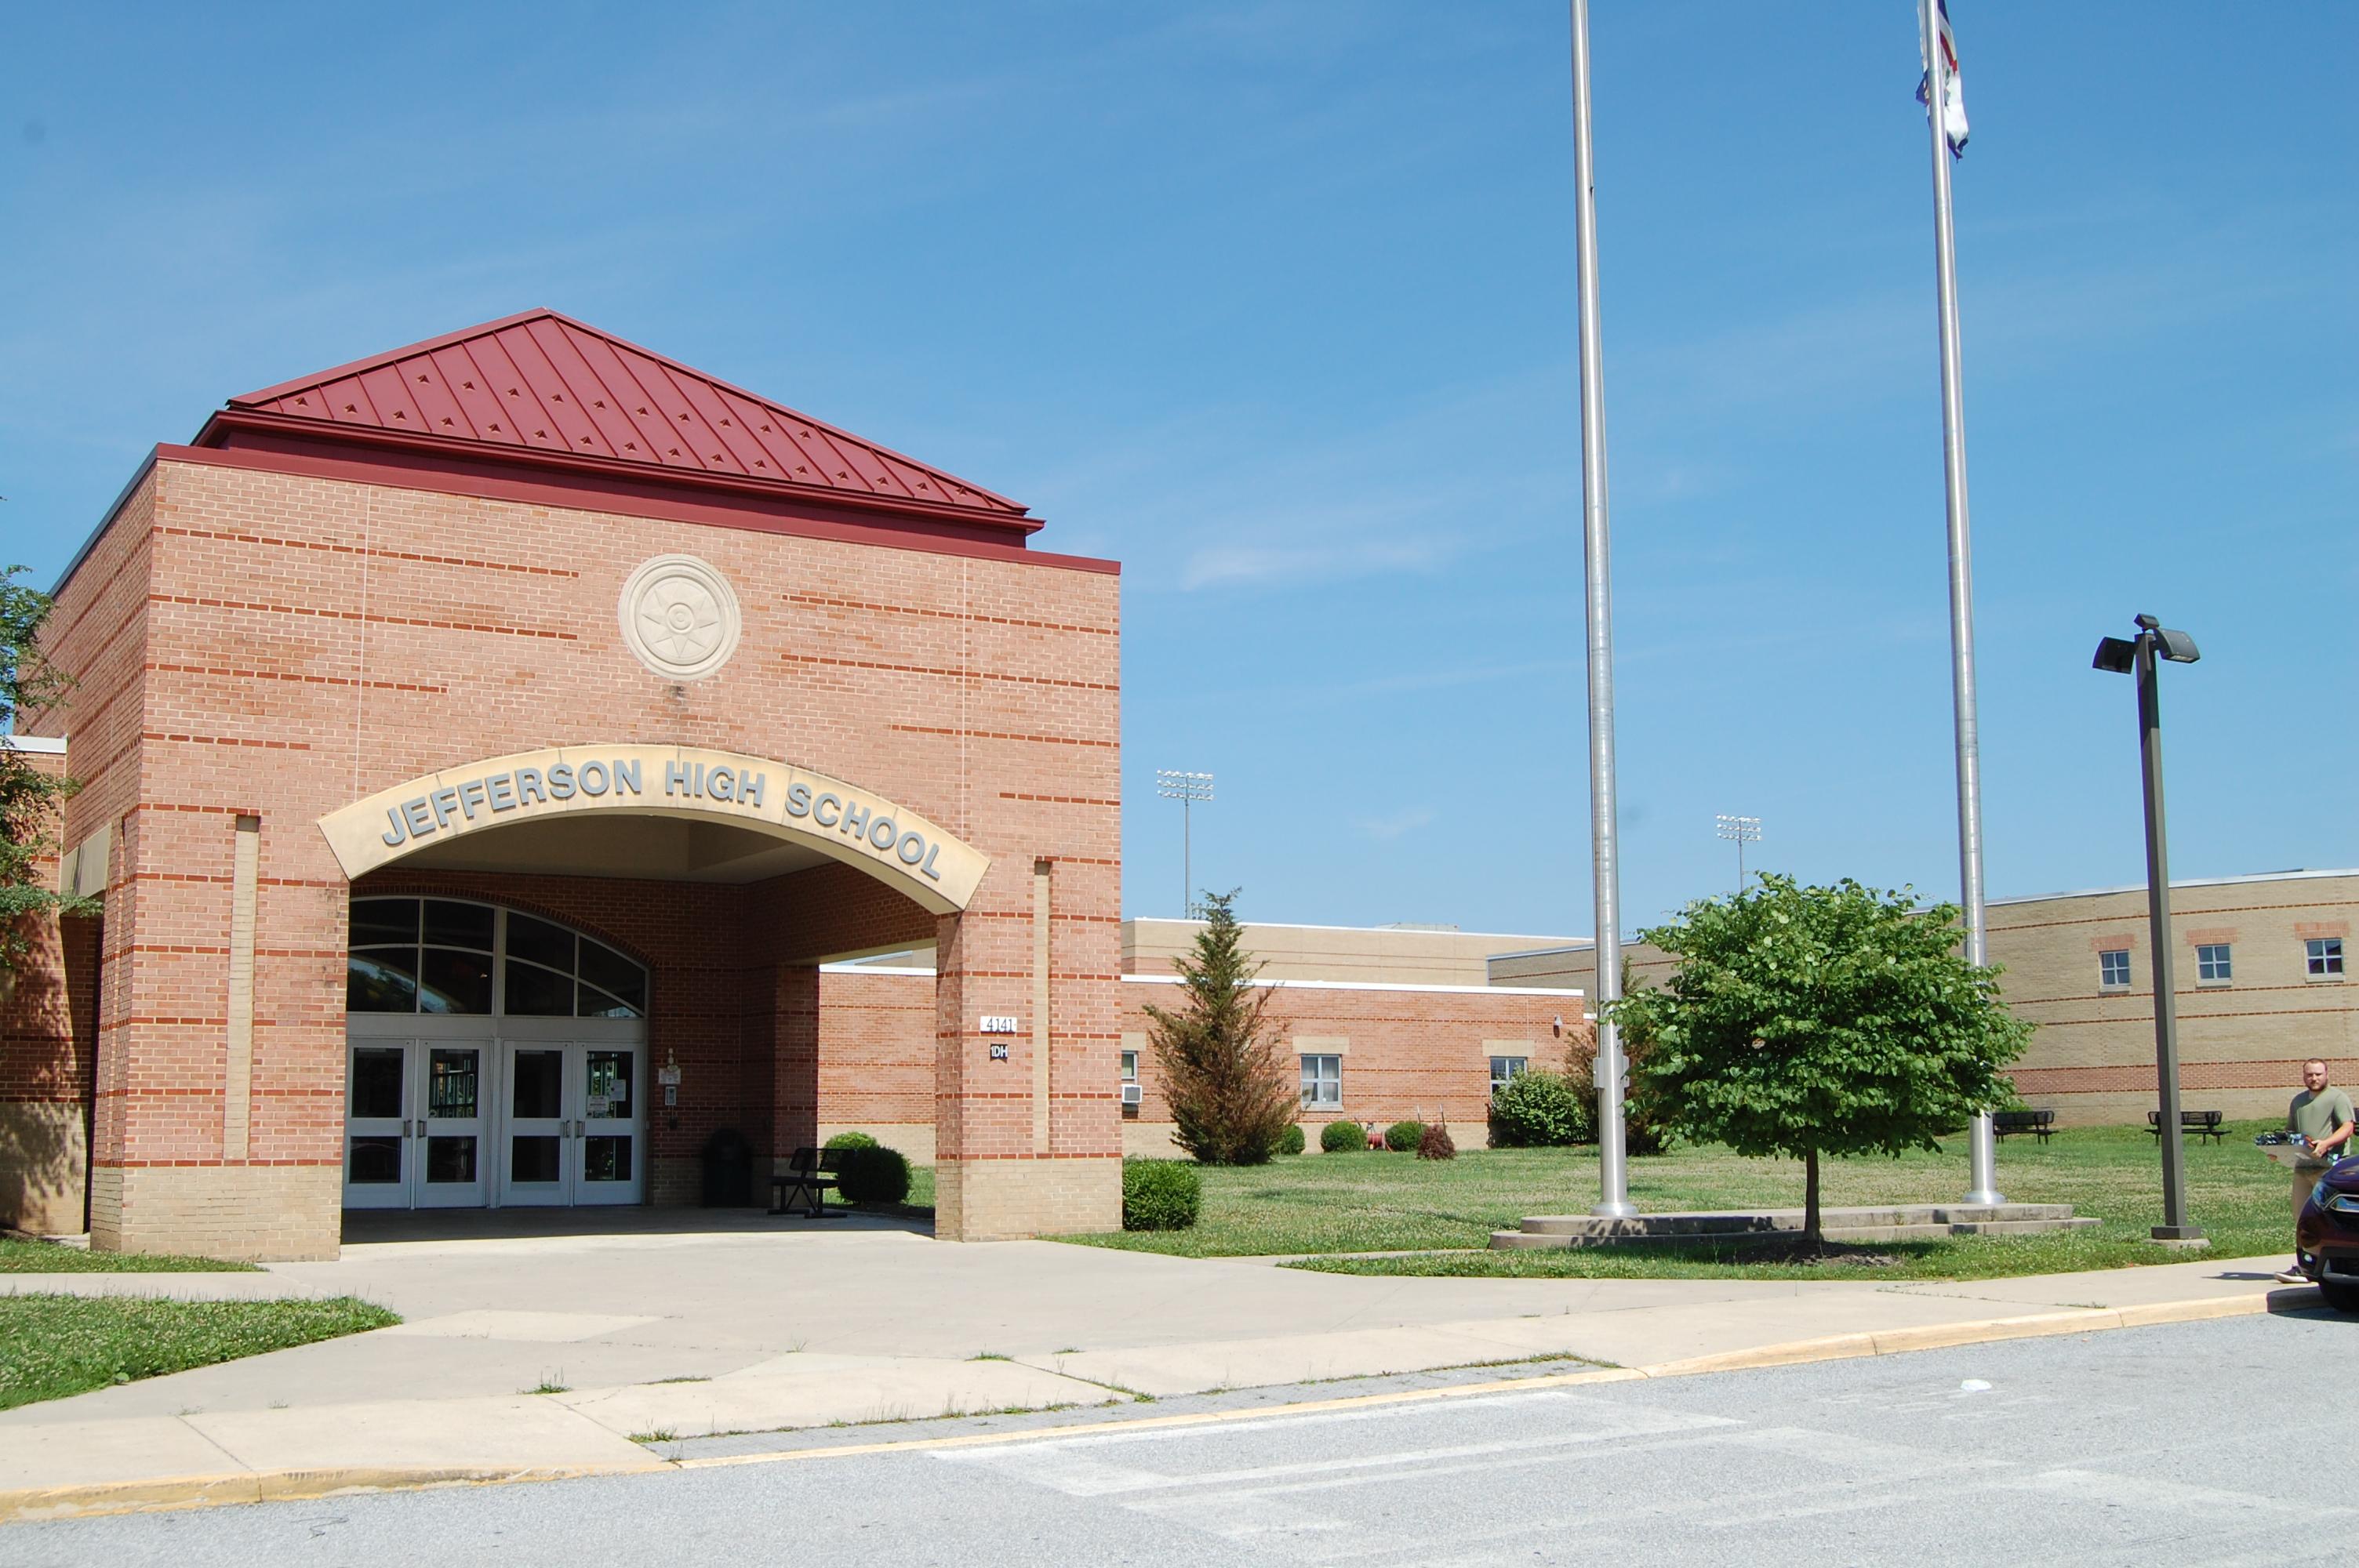 Jefferson High